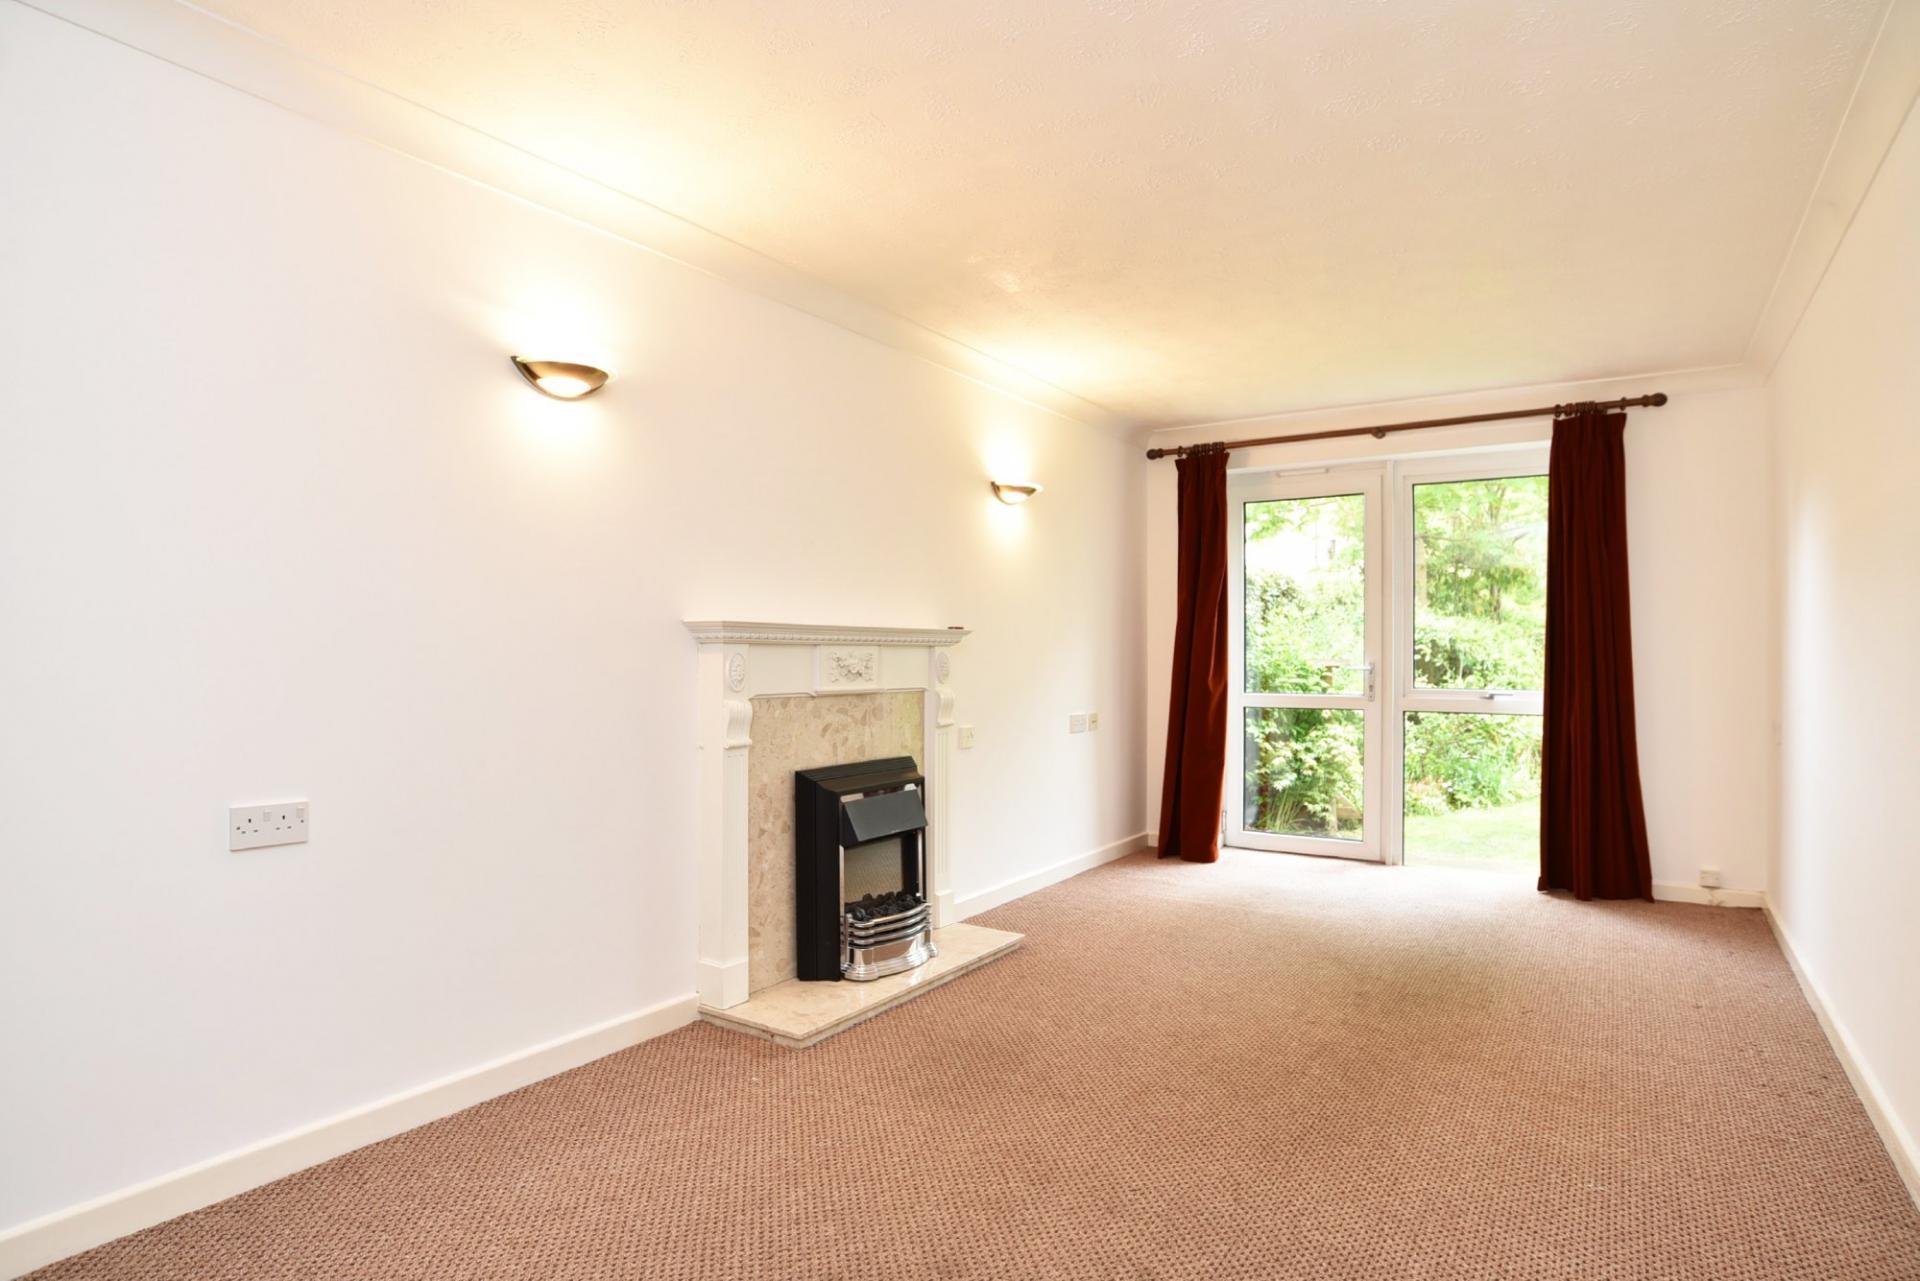 1 Bedroom Apartment For Sale In Harrogate